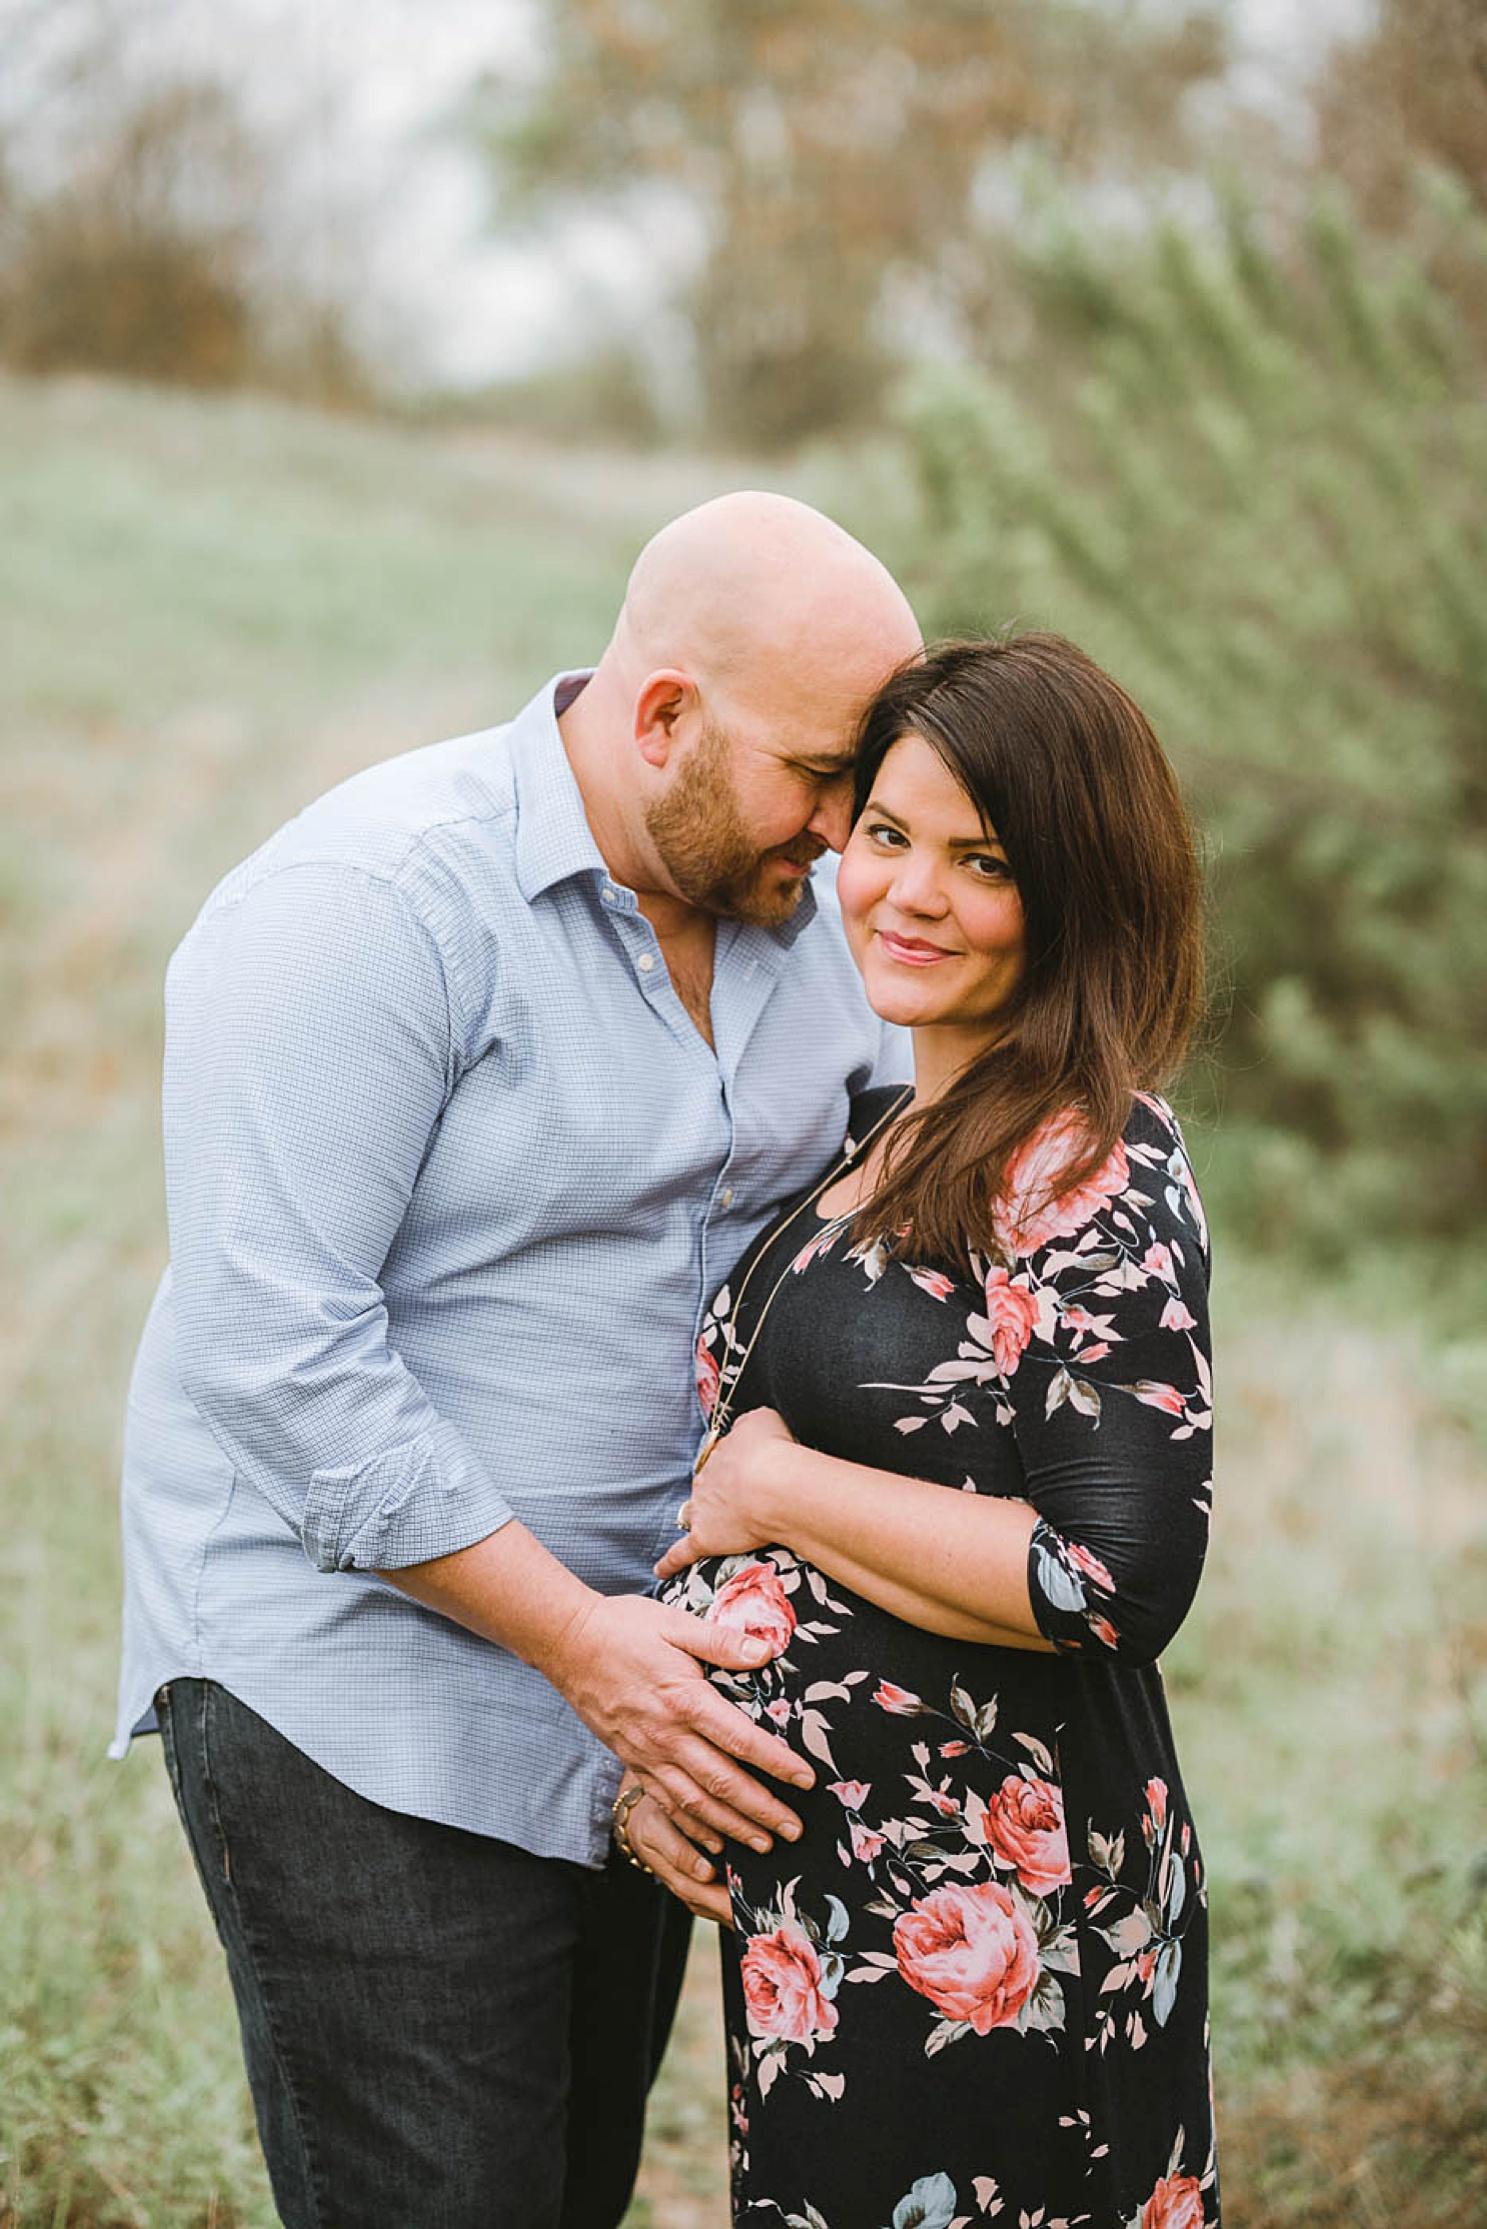 natural-lifestyle-maternity-family-photographer-austin-texas_0321.jpg